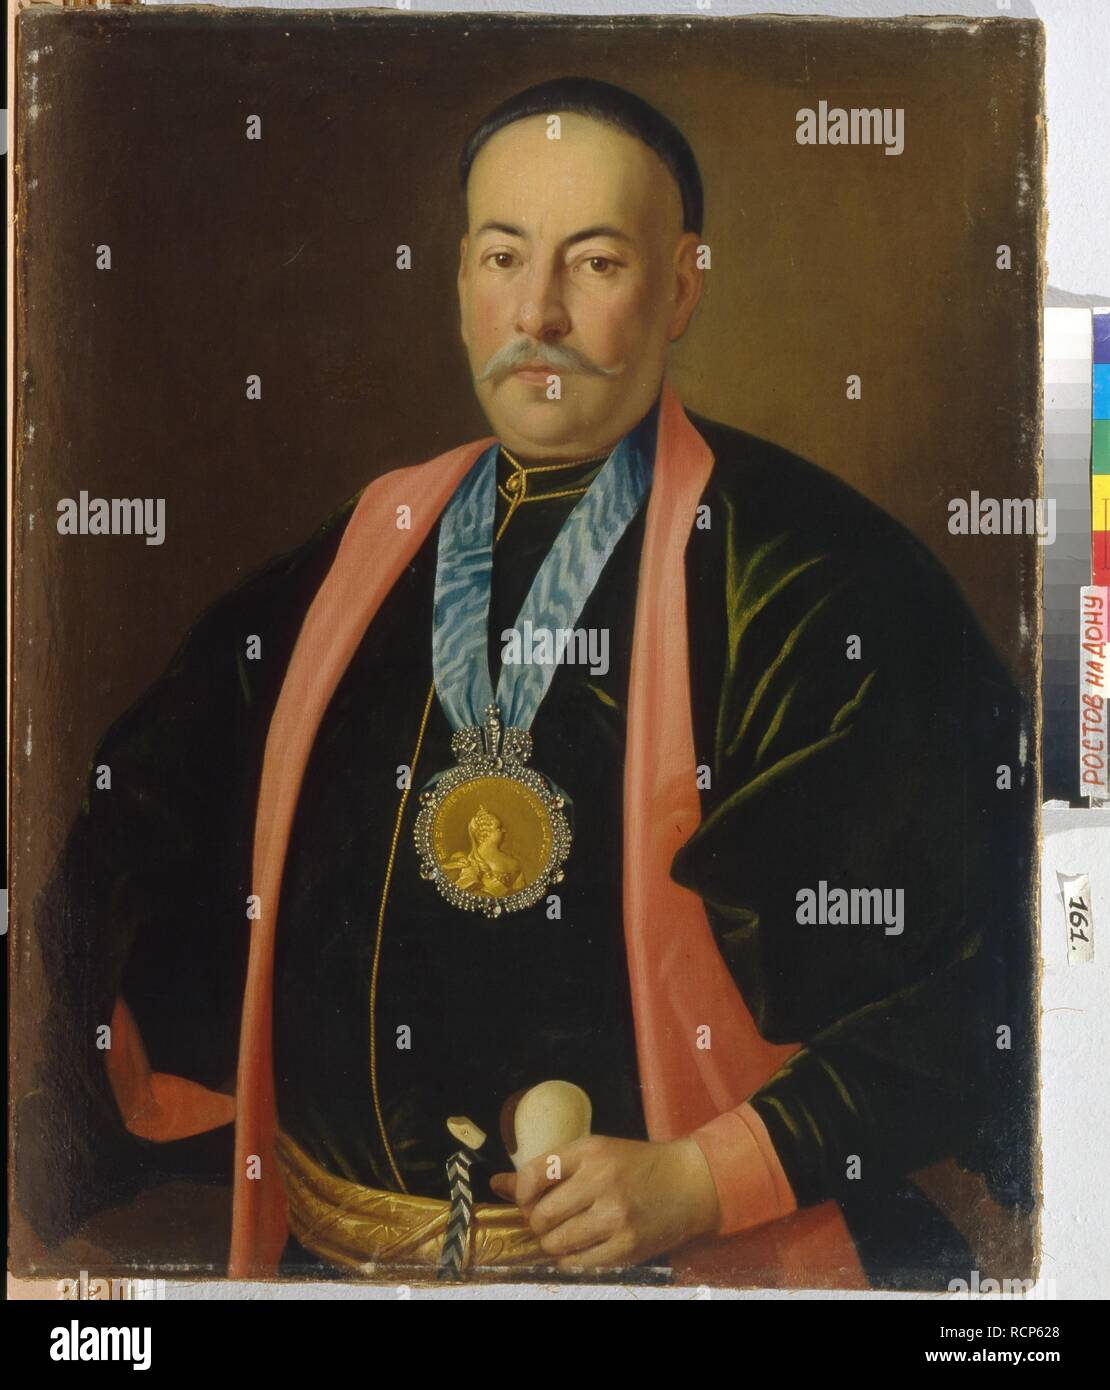 Portrait of Stepan Danilovich Yefremov, Ataman of the Don Cossack Host. Museum: Regional Art Museum, Rostov on Don. Author: Christineck, Carl Ludwig Johann. - Stock Image